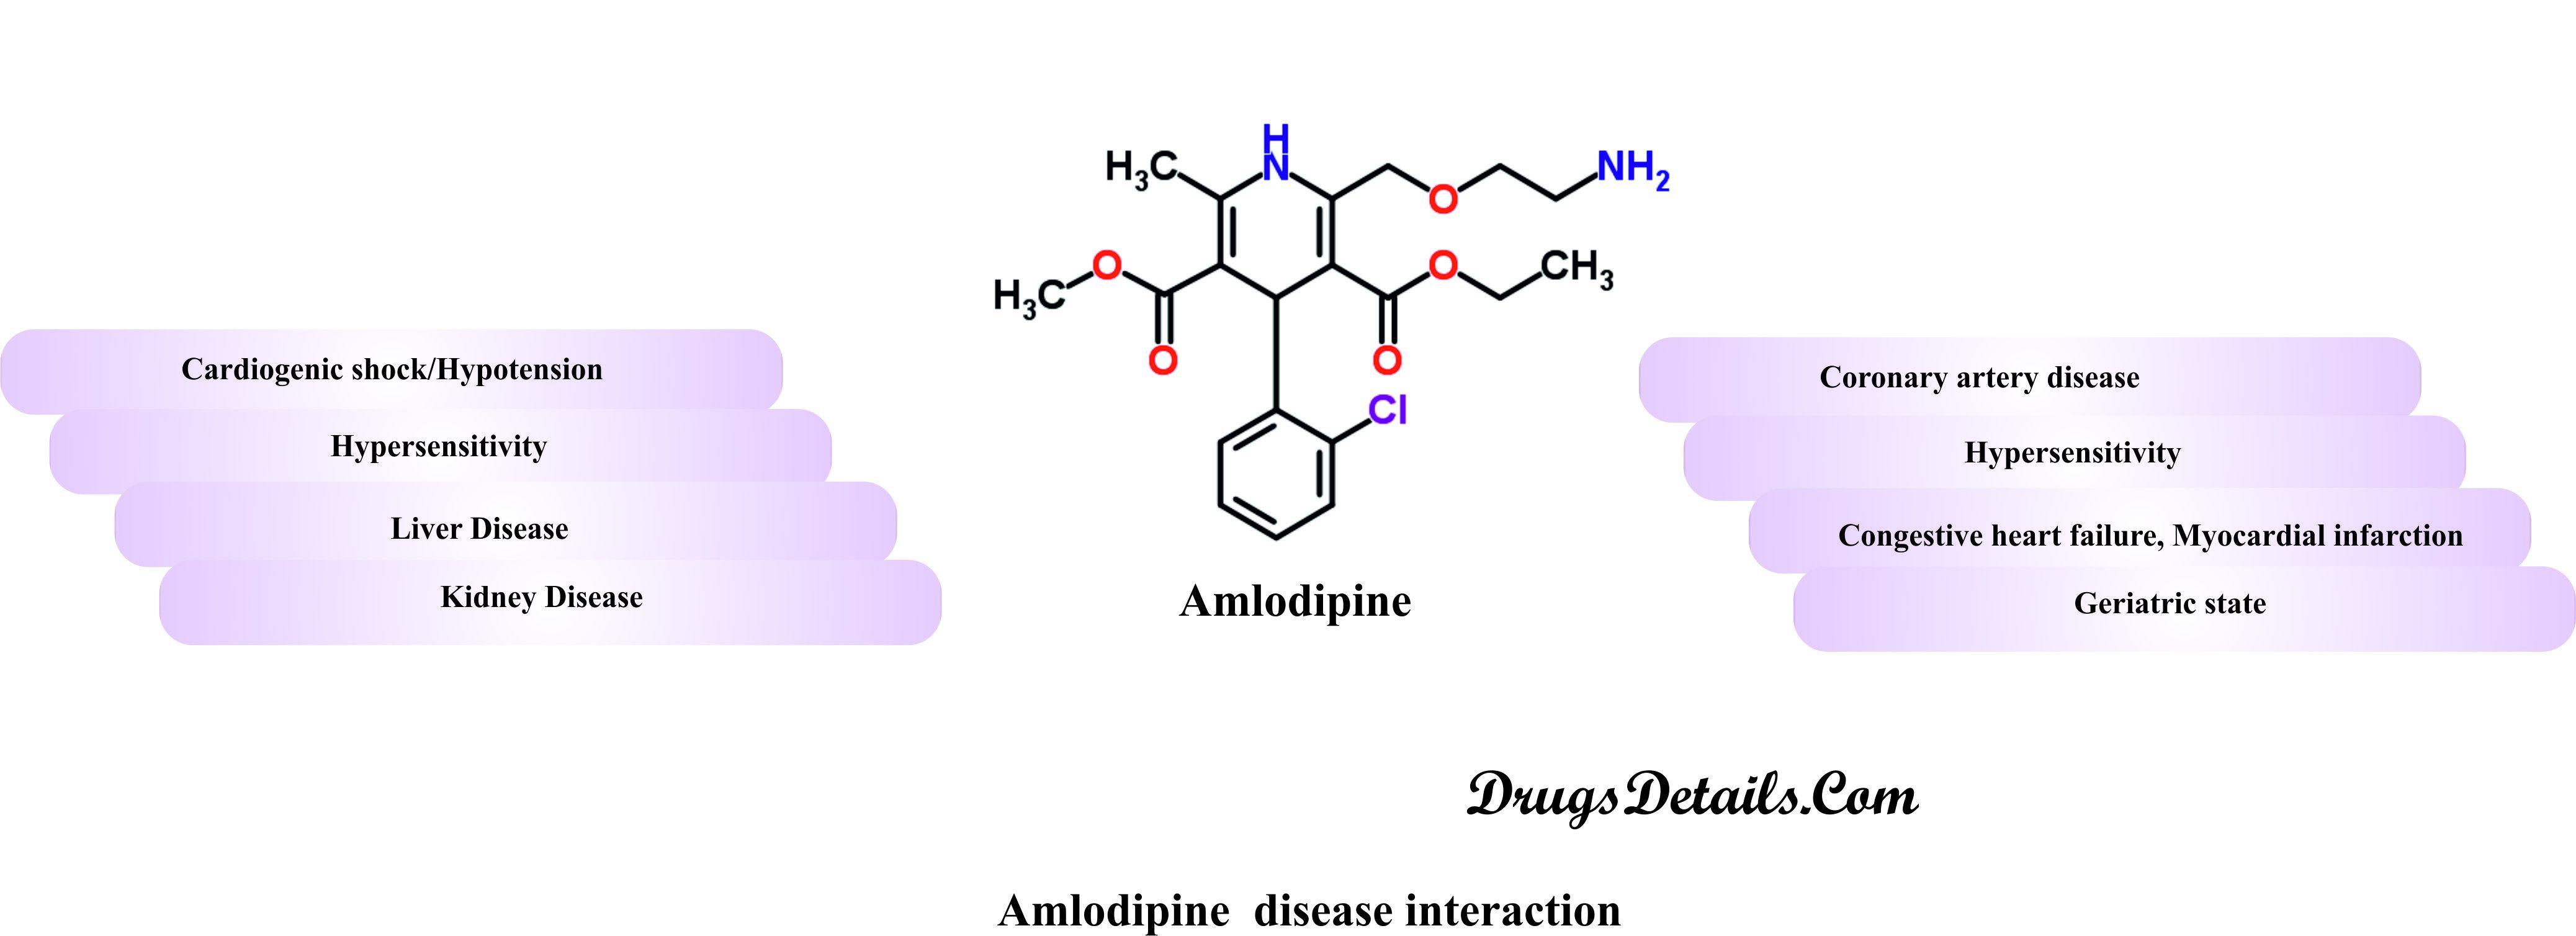 Amlodipine Medication Interactions